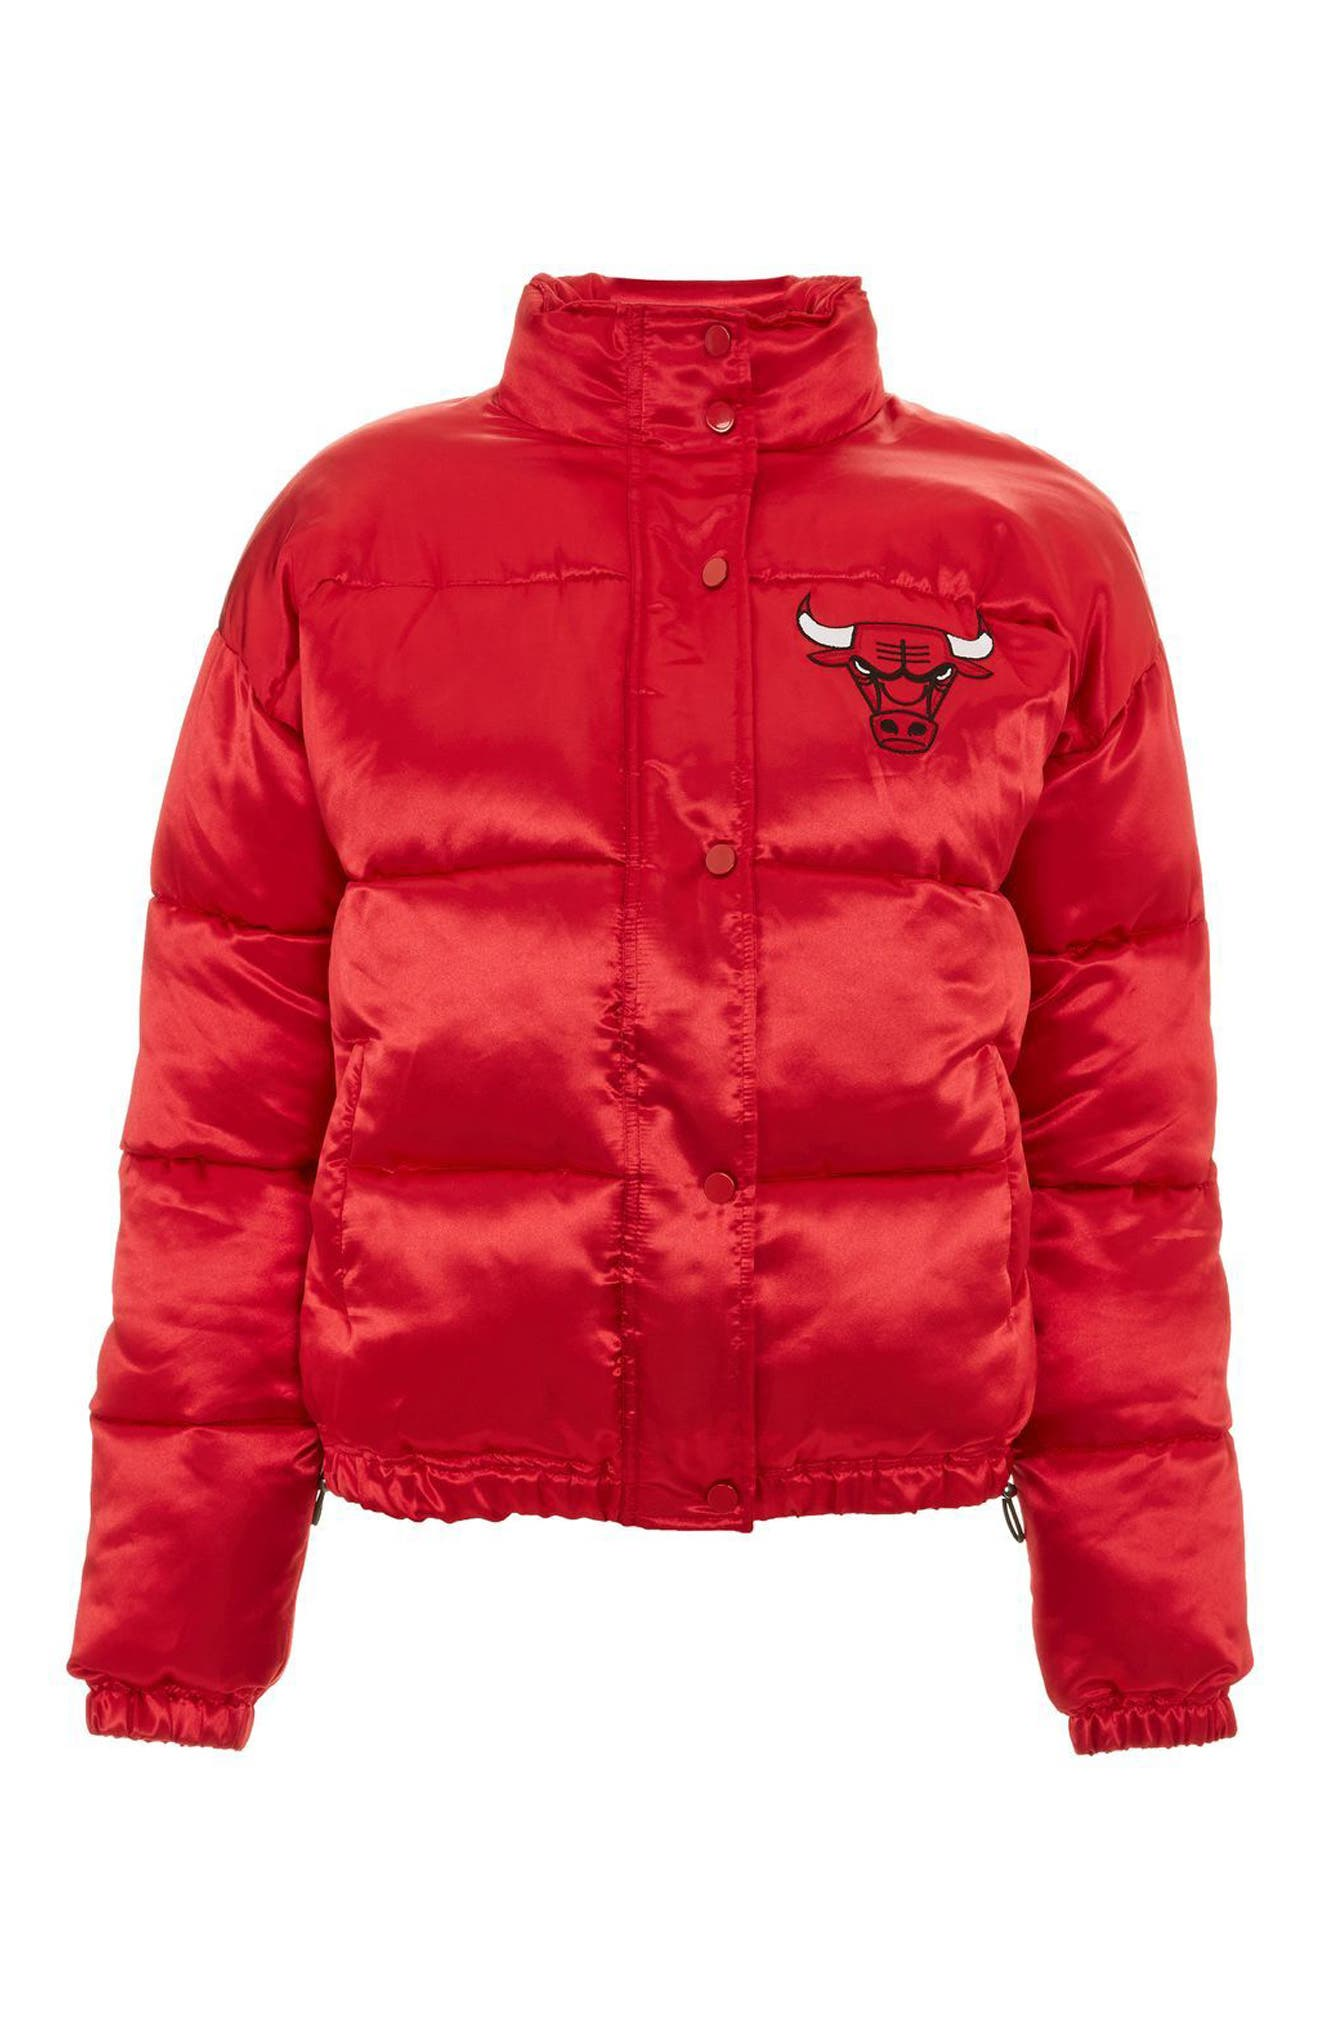 x UNK Chicago Bulls Puffer Jacket,                             Alternate thumbnail 2, color,